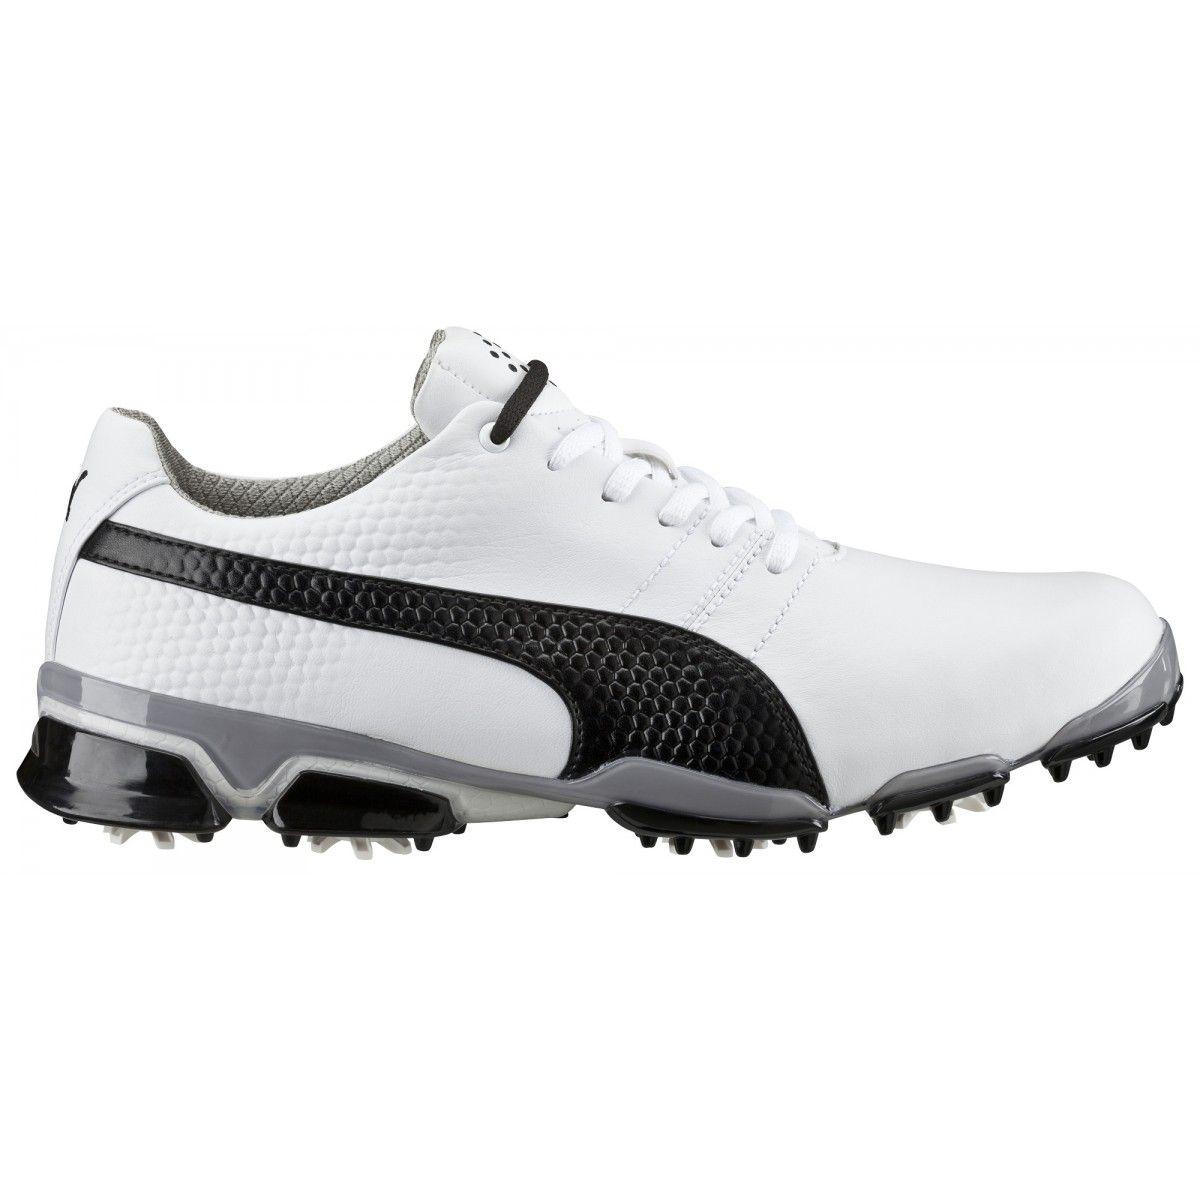 Mens PUMA Men's Biofusion Golf Shoe Coupon Code Size 45